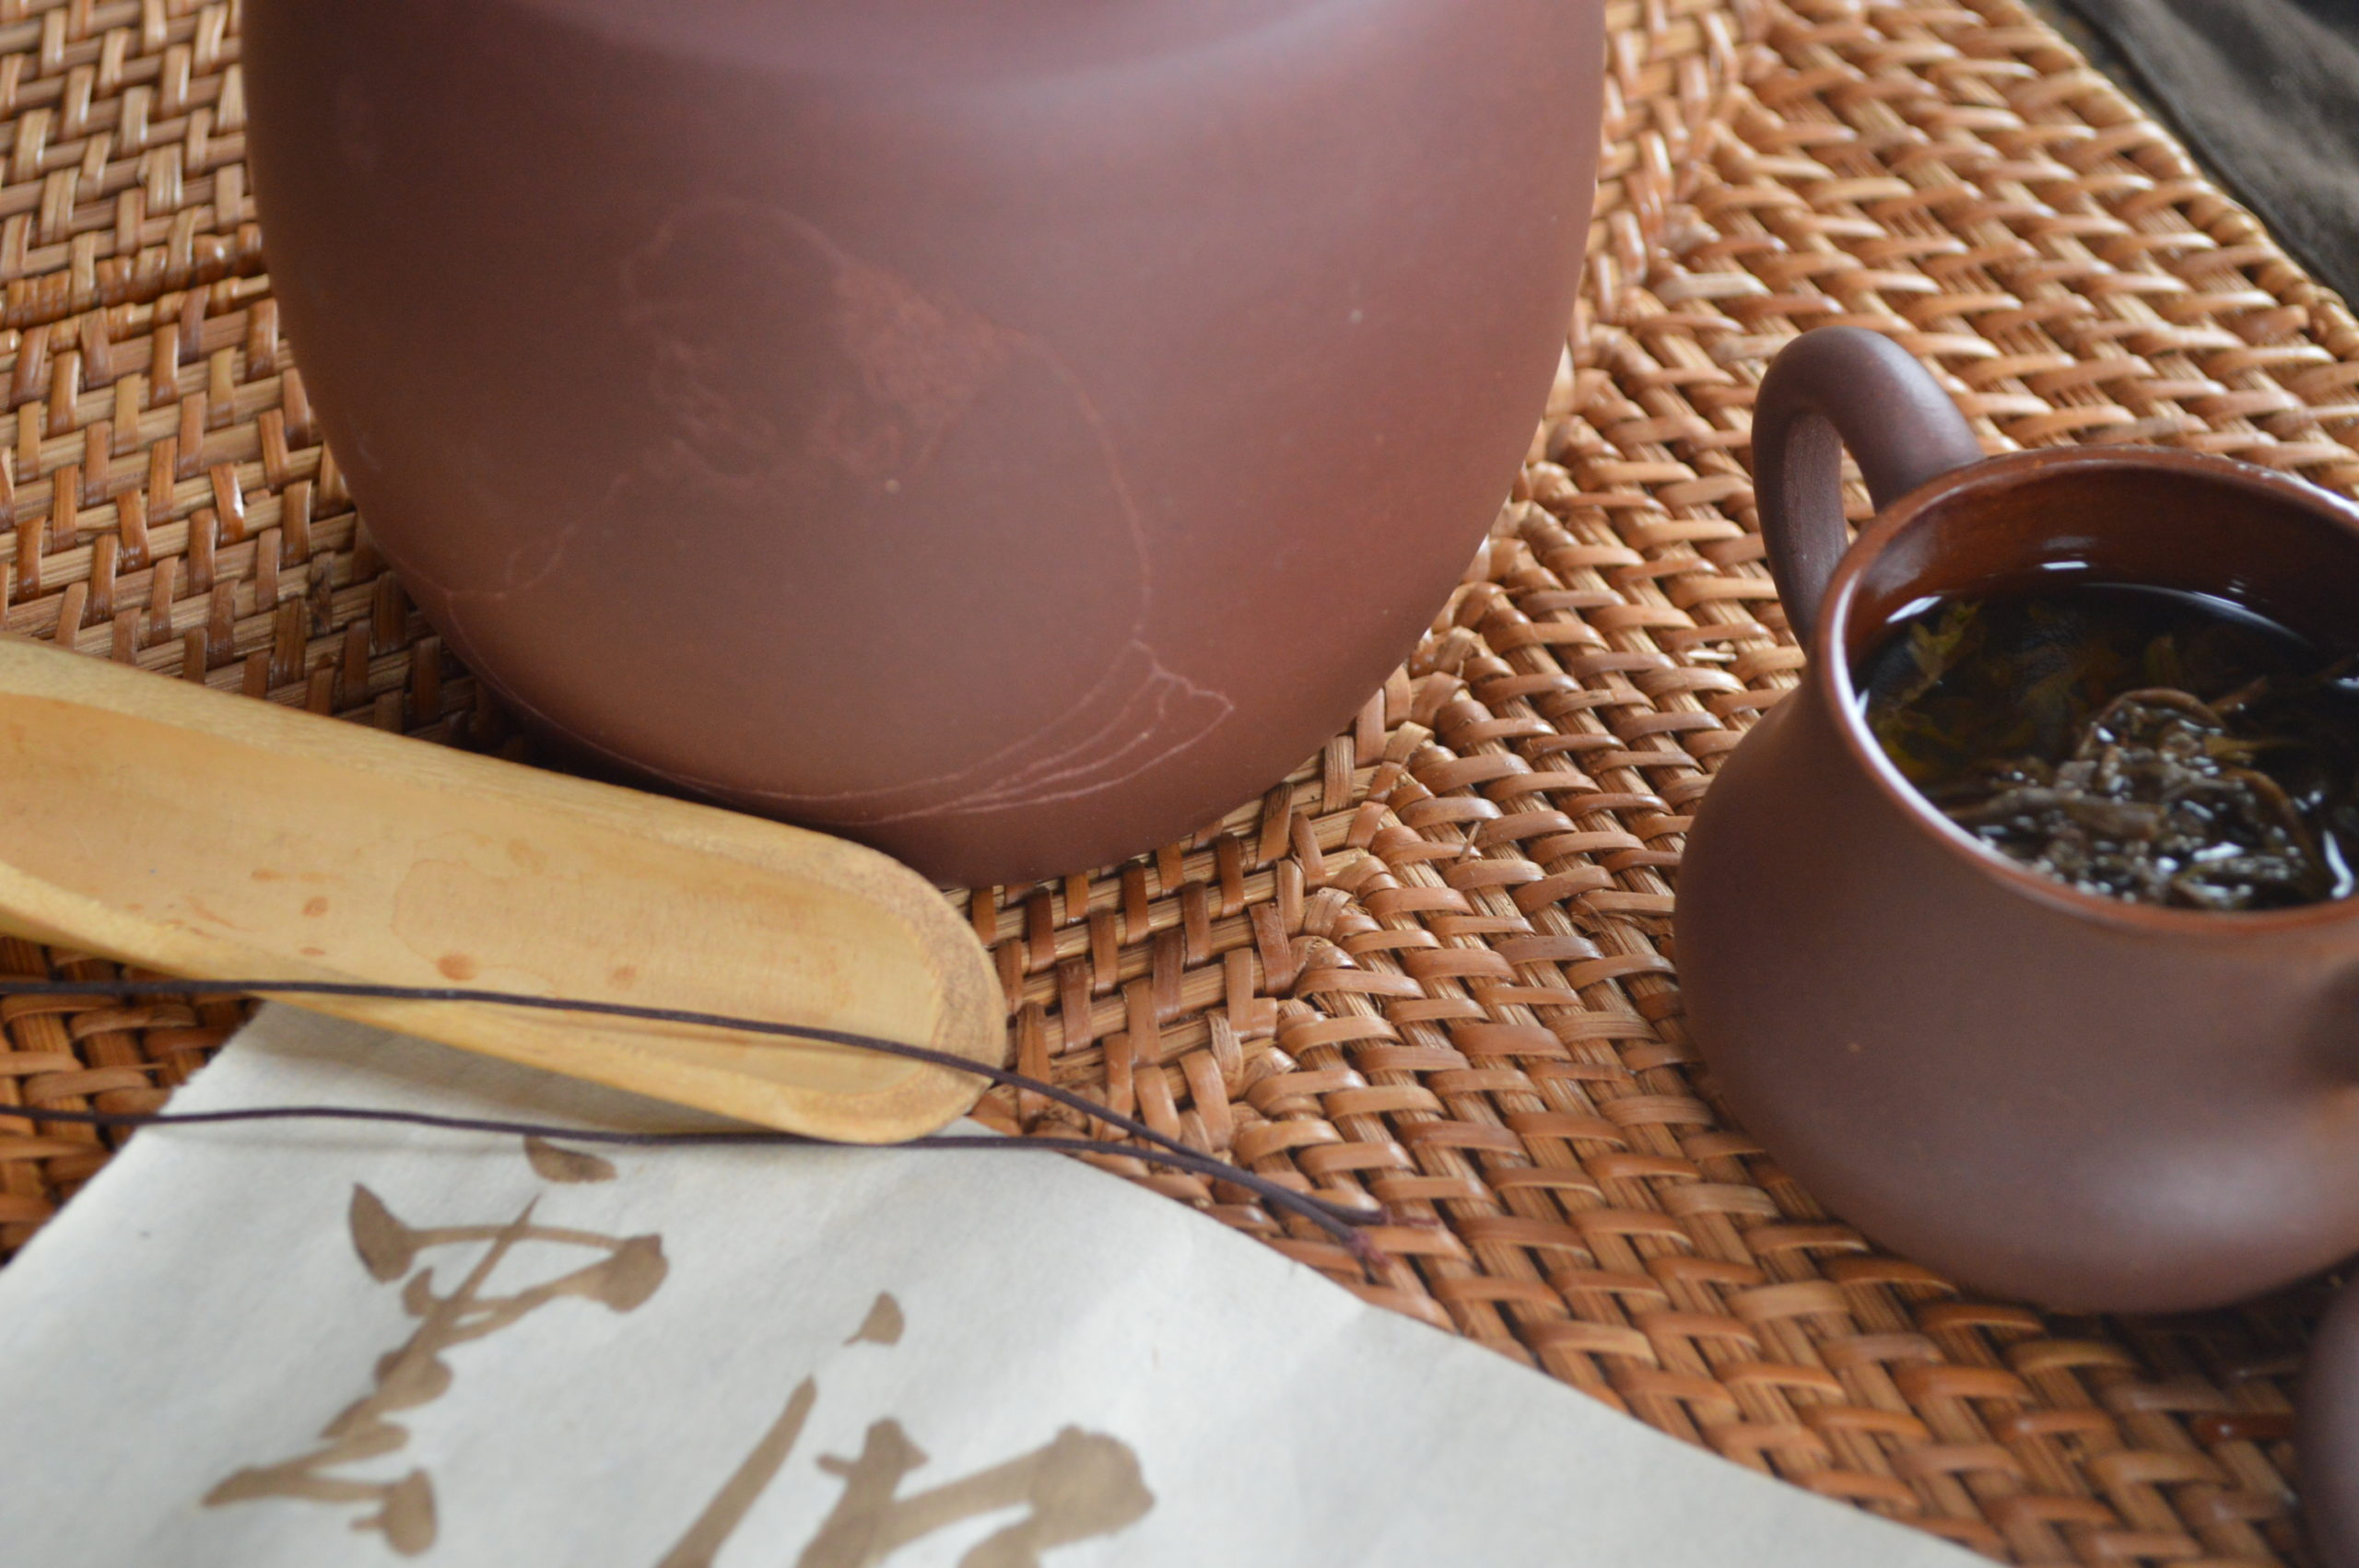 https://shop.liu-tea-art.com/wp-content/uploads/2019/07/DSC_0120-1-scaled.jpg